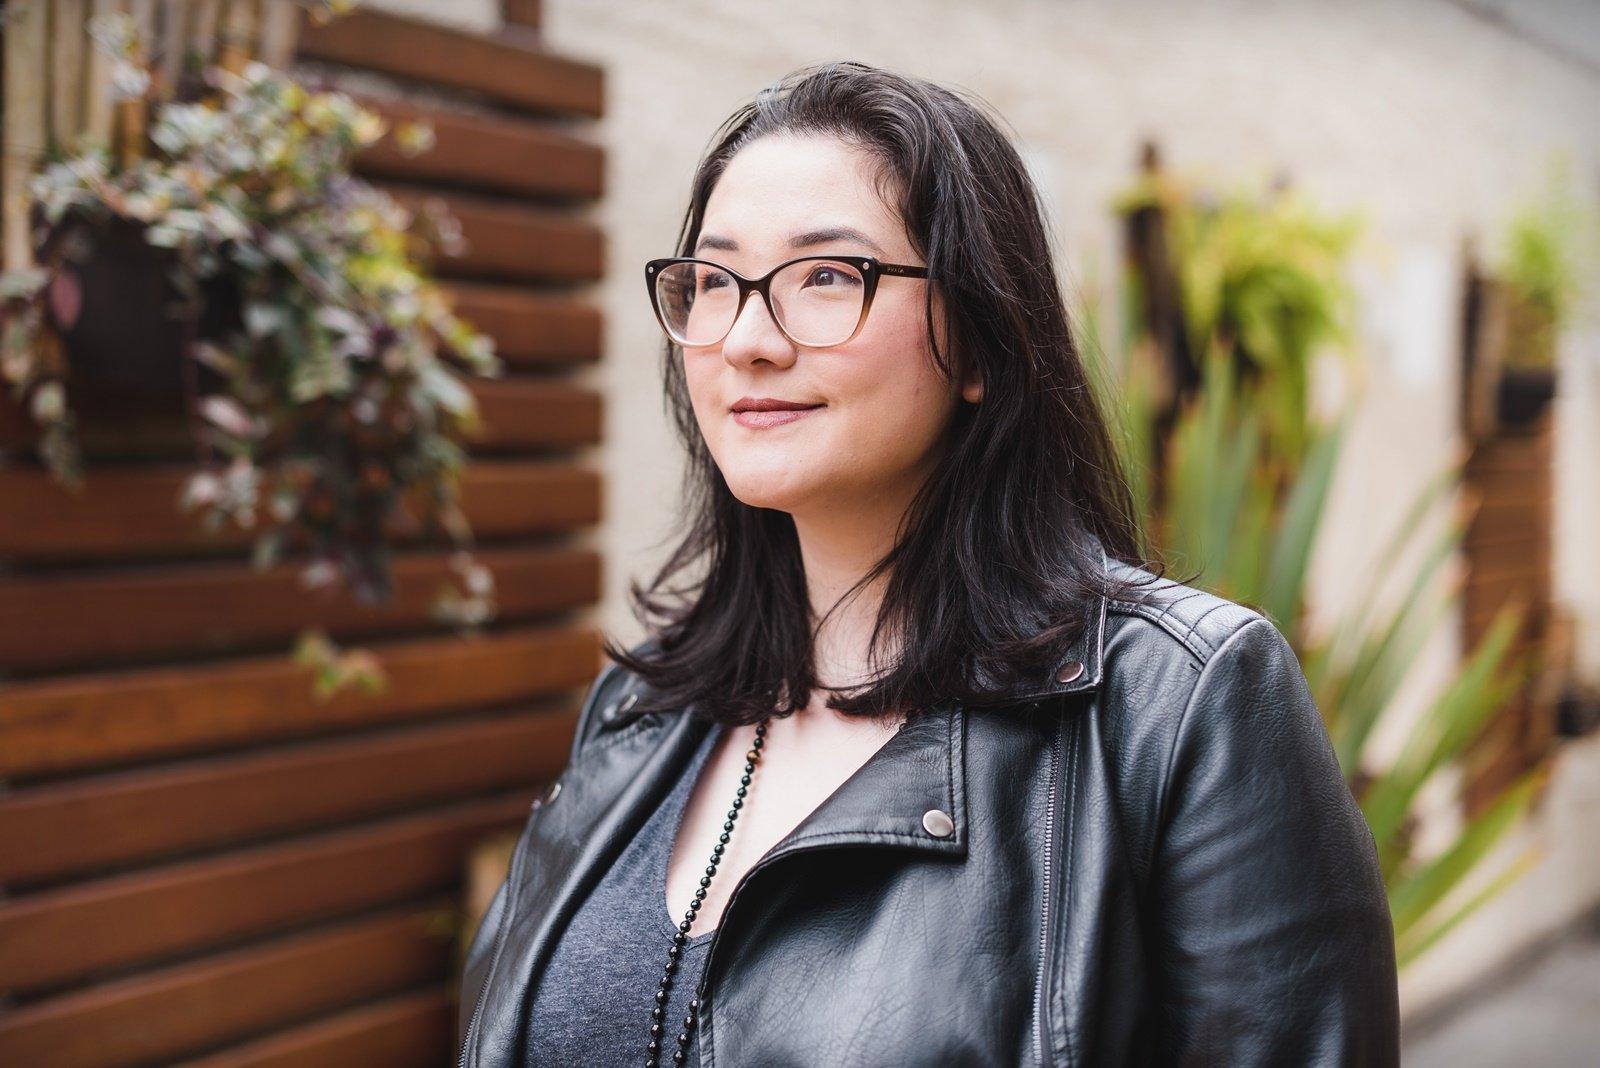 Beatriz Yumi, data scientista formada na tera - foto por HelenaYoshioka